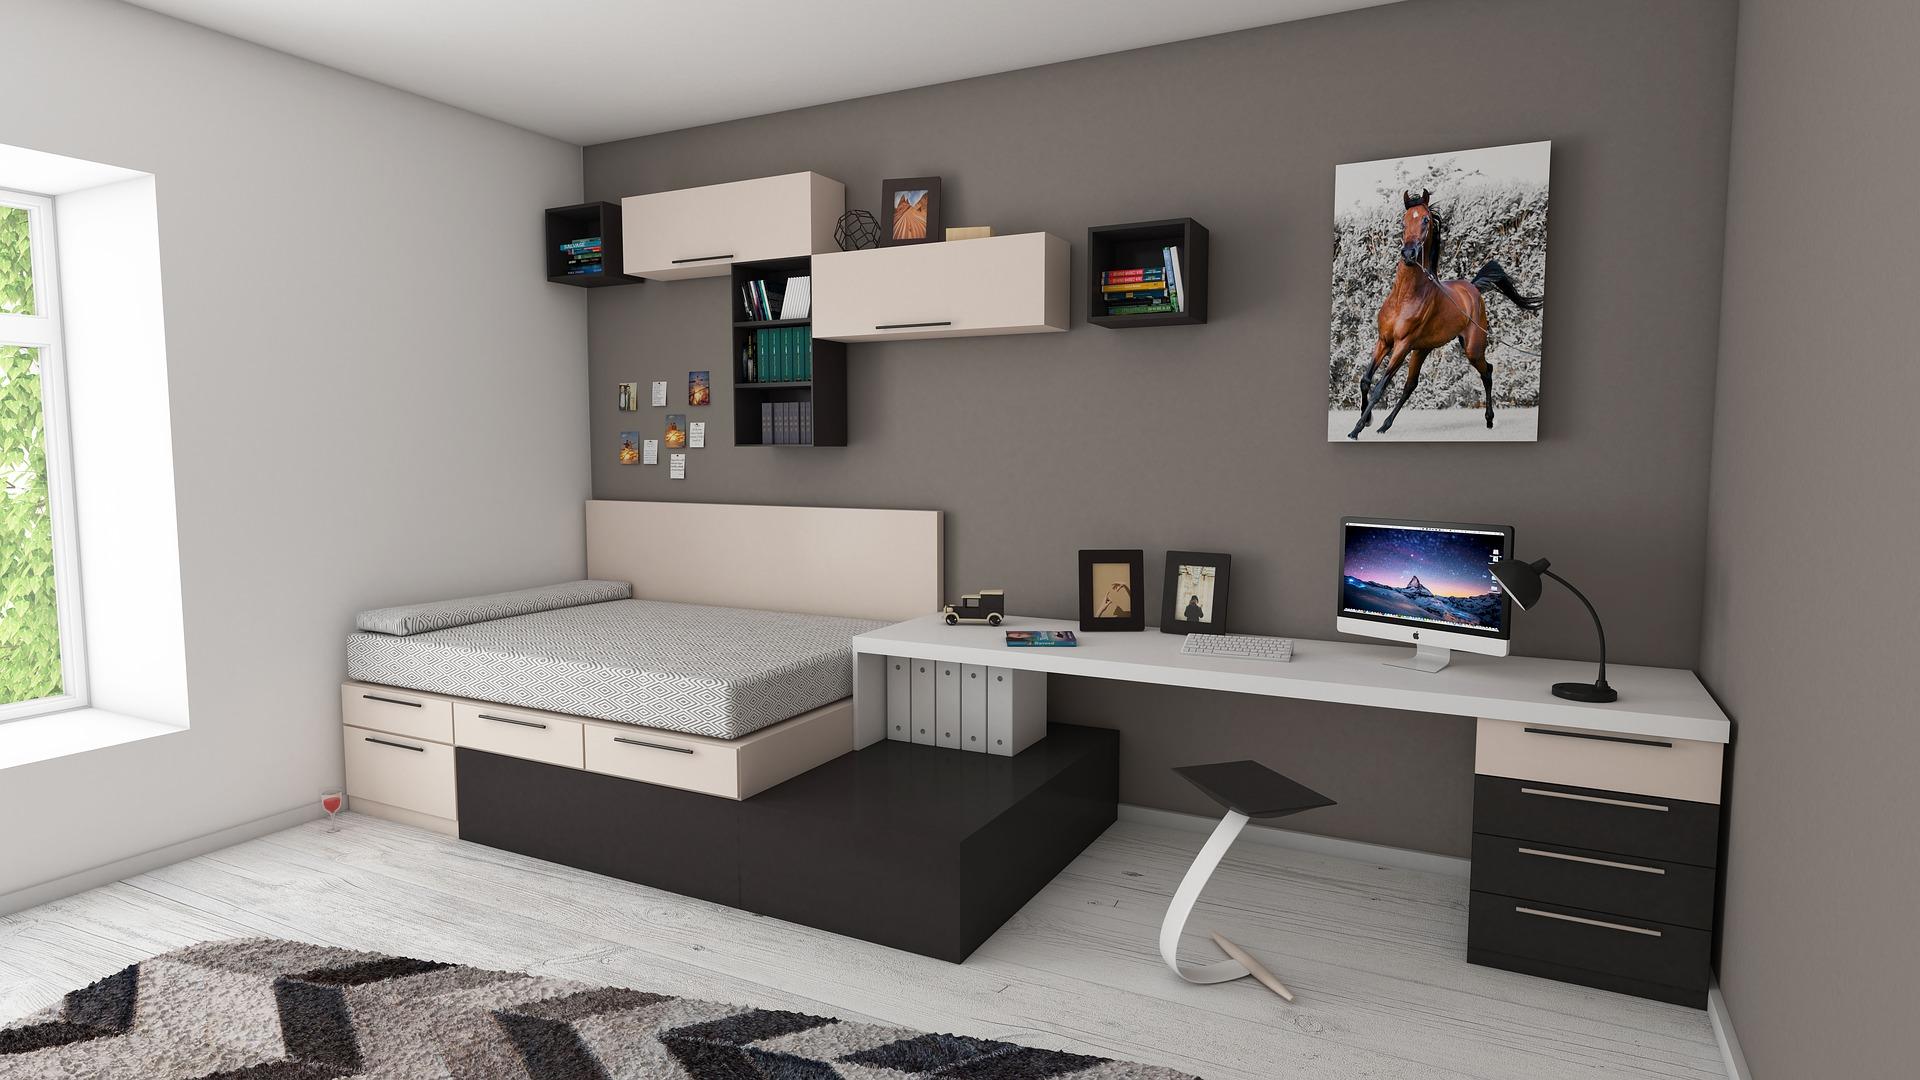 Kings Floors - Mobile Flooring Showroom - We Come To You